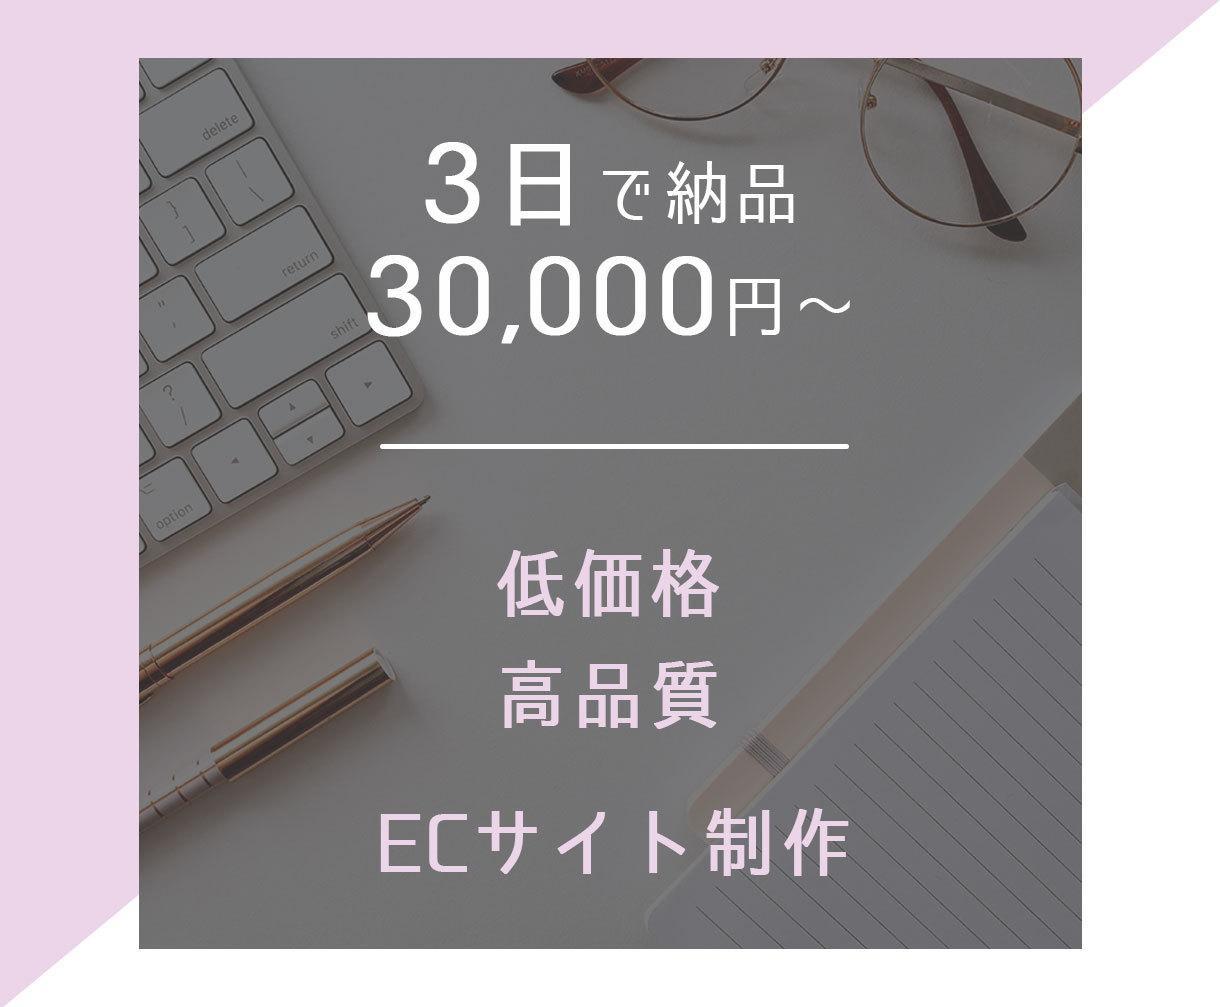 ECサイトを3万円で制作します シンプルでわかりやすい売れるECサイト! イメージ1